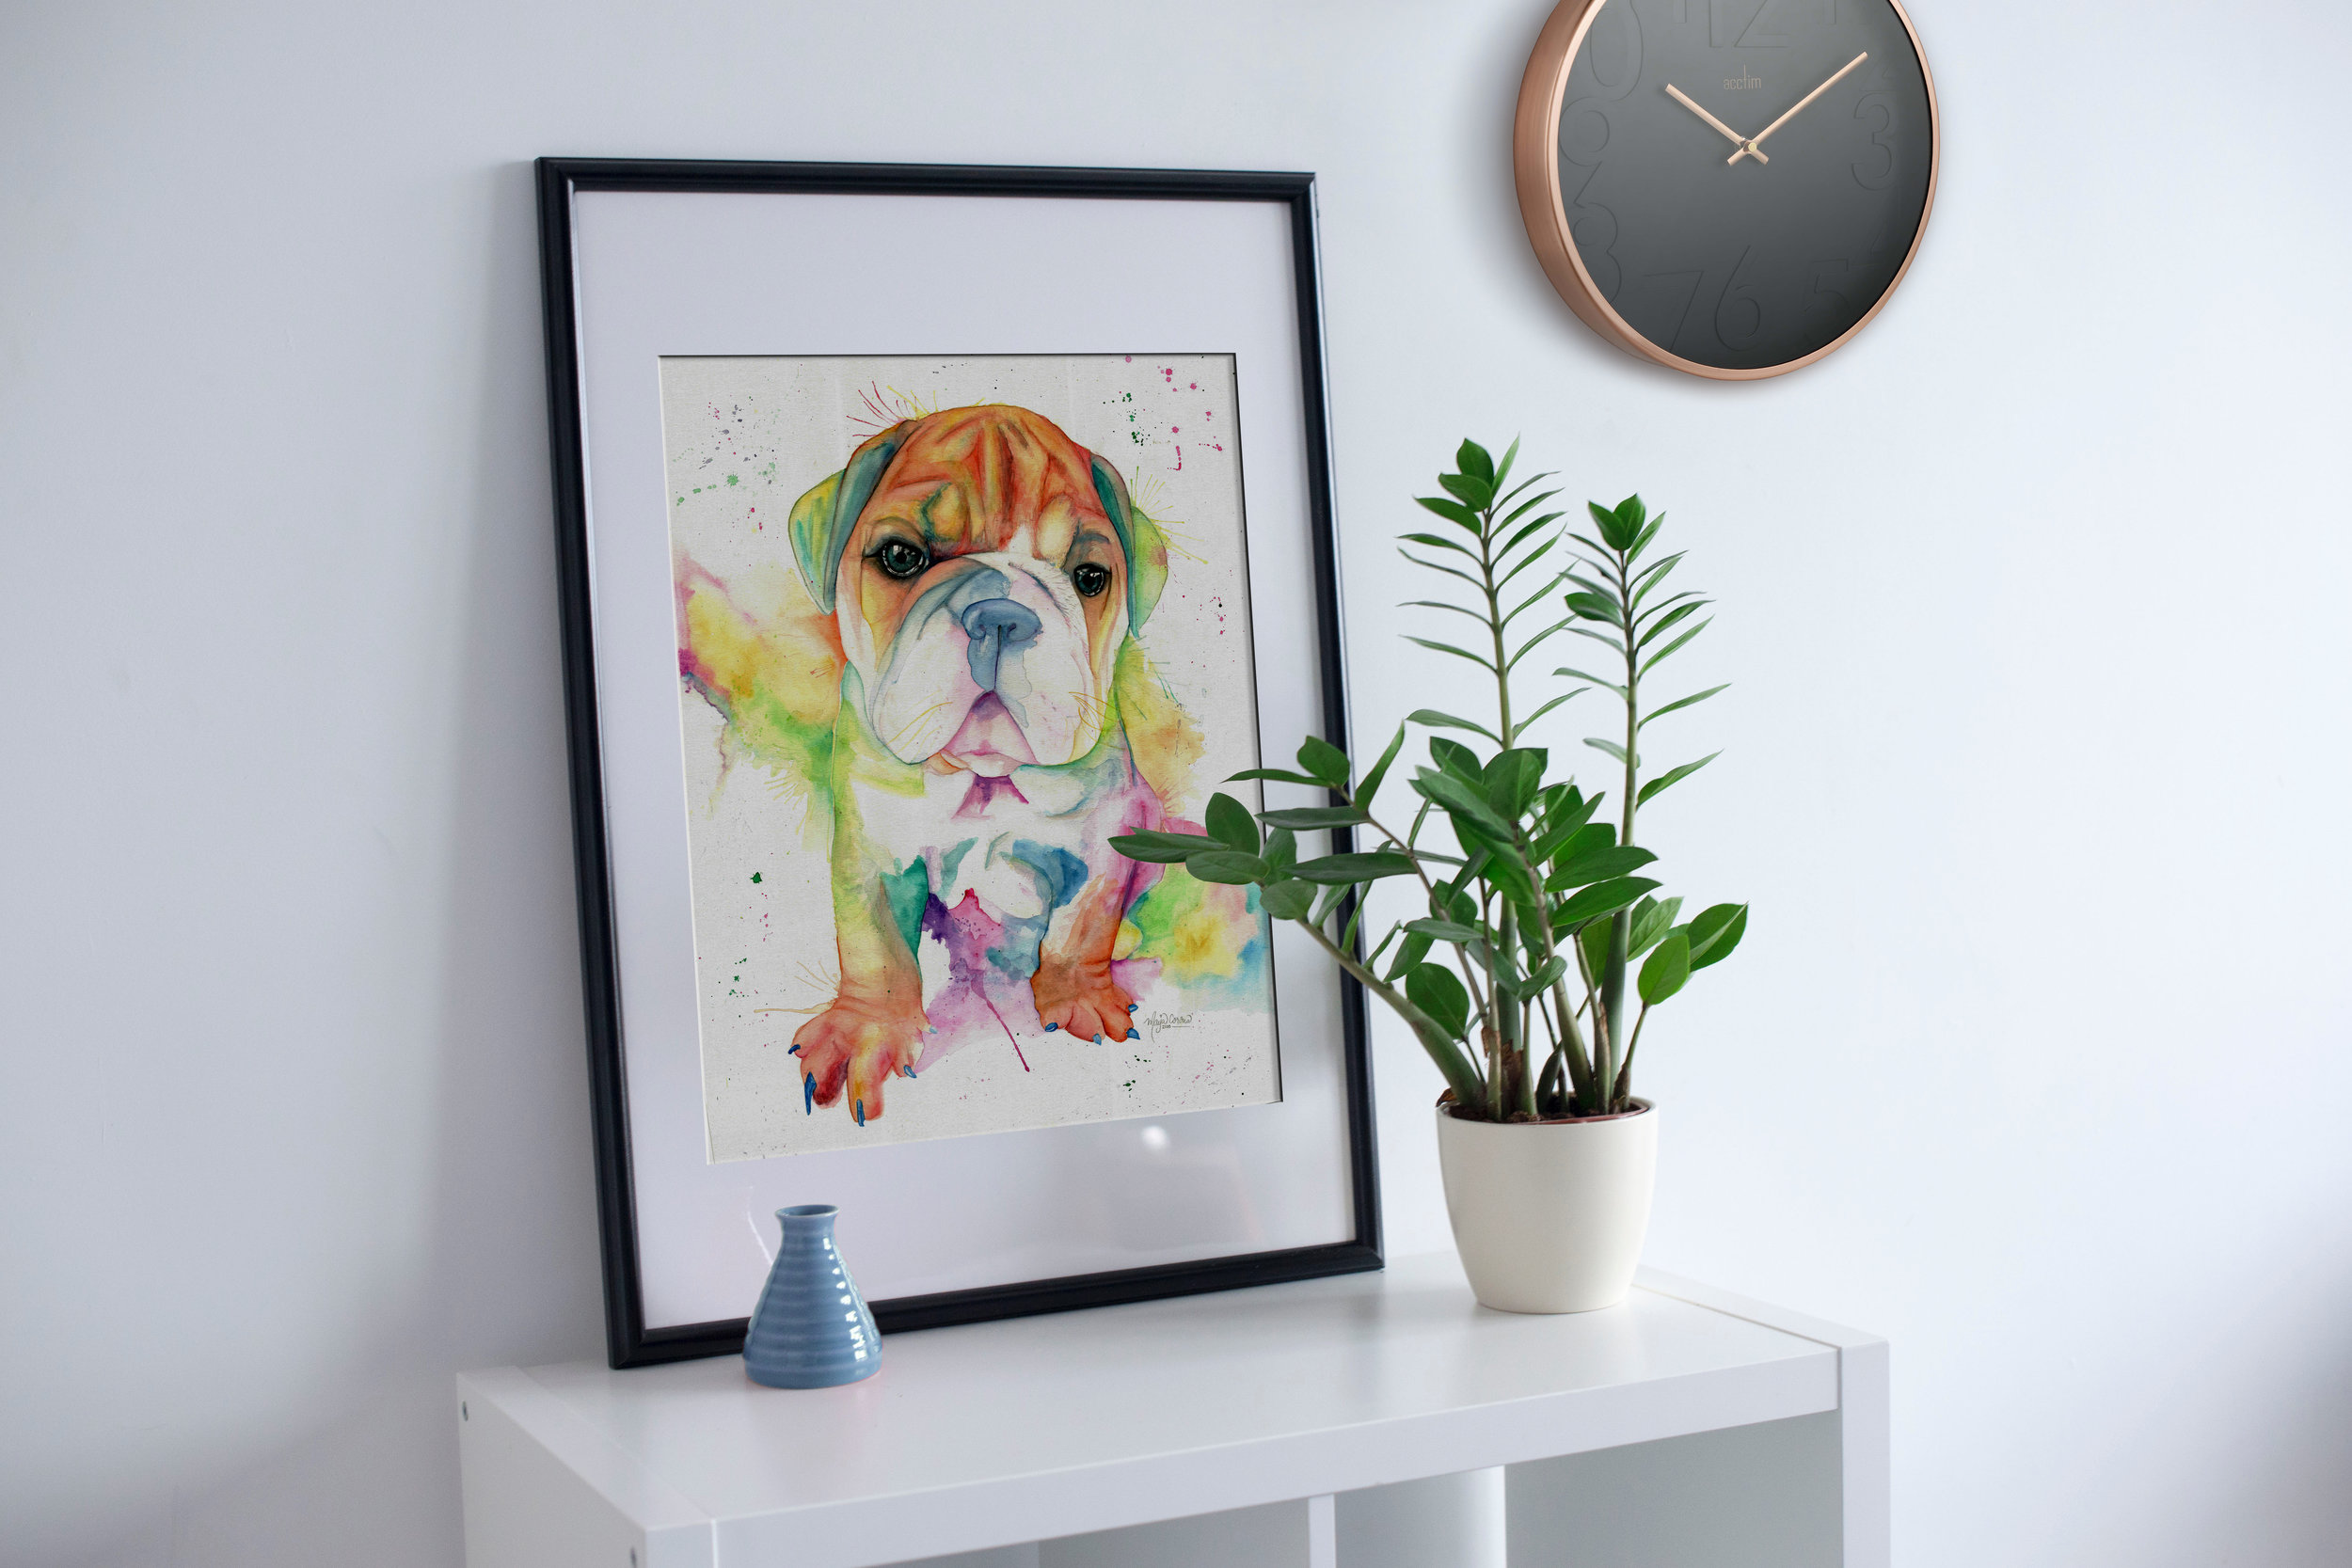 tug-watercolour-mockup-frame copy.jpg